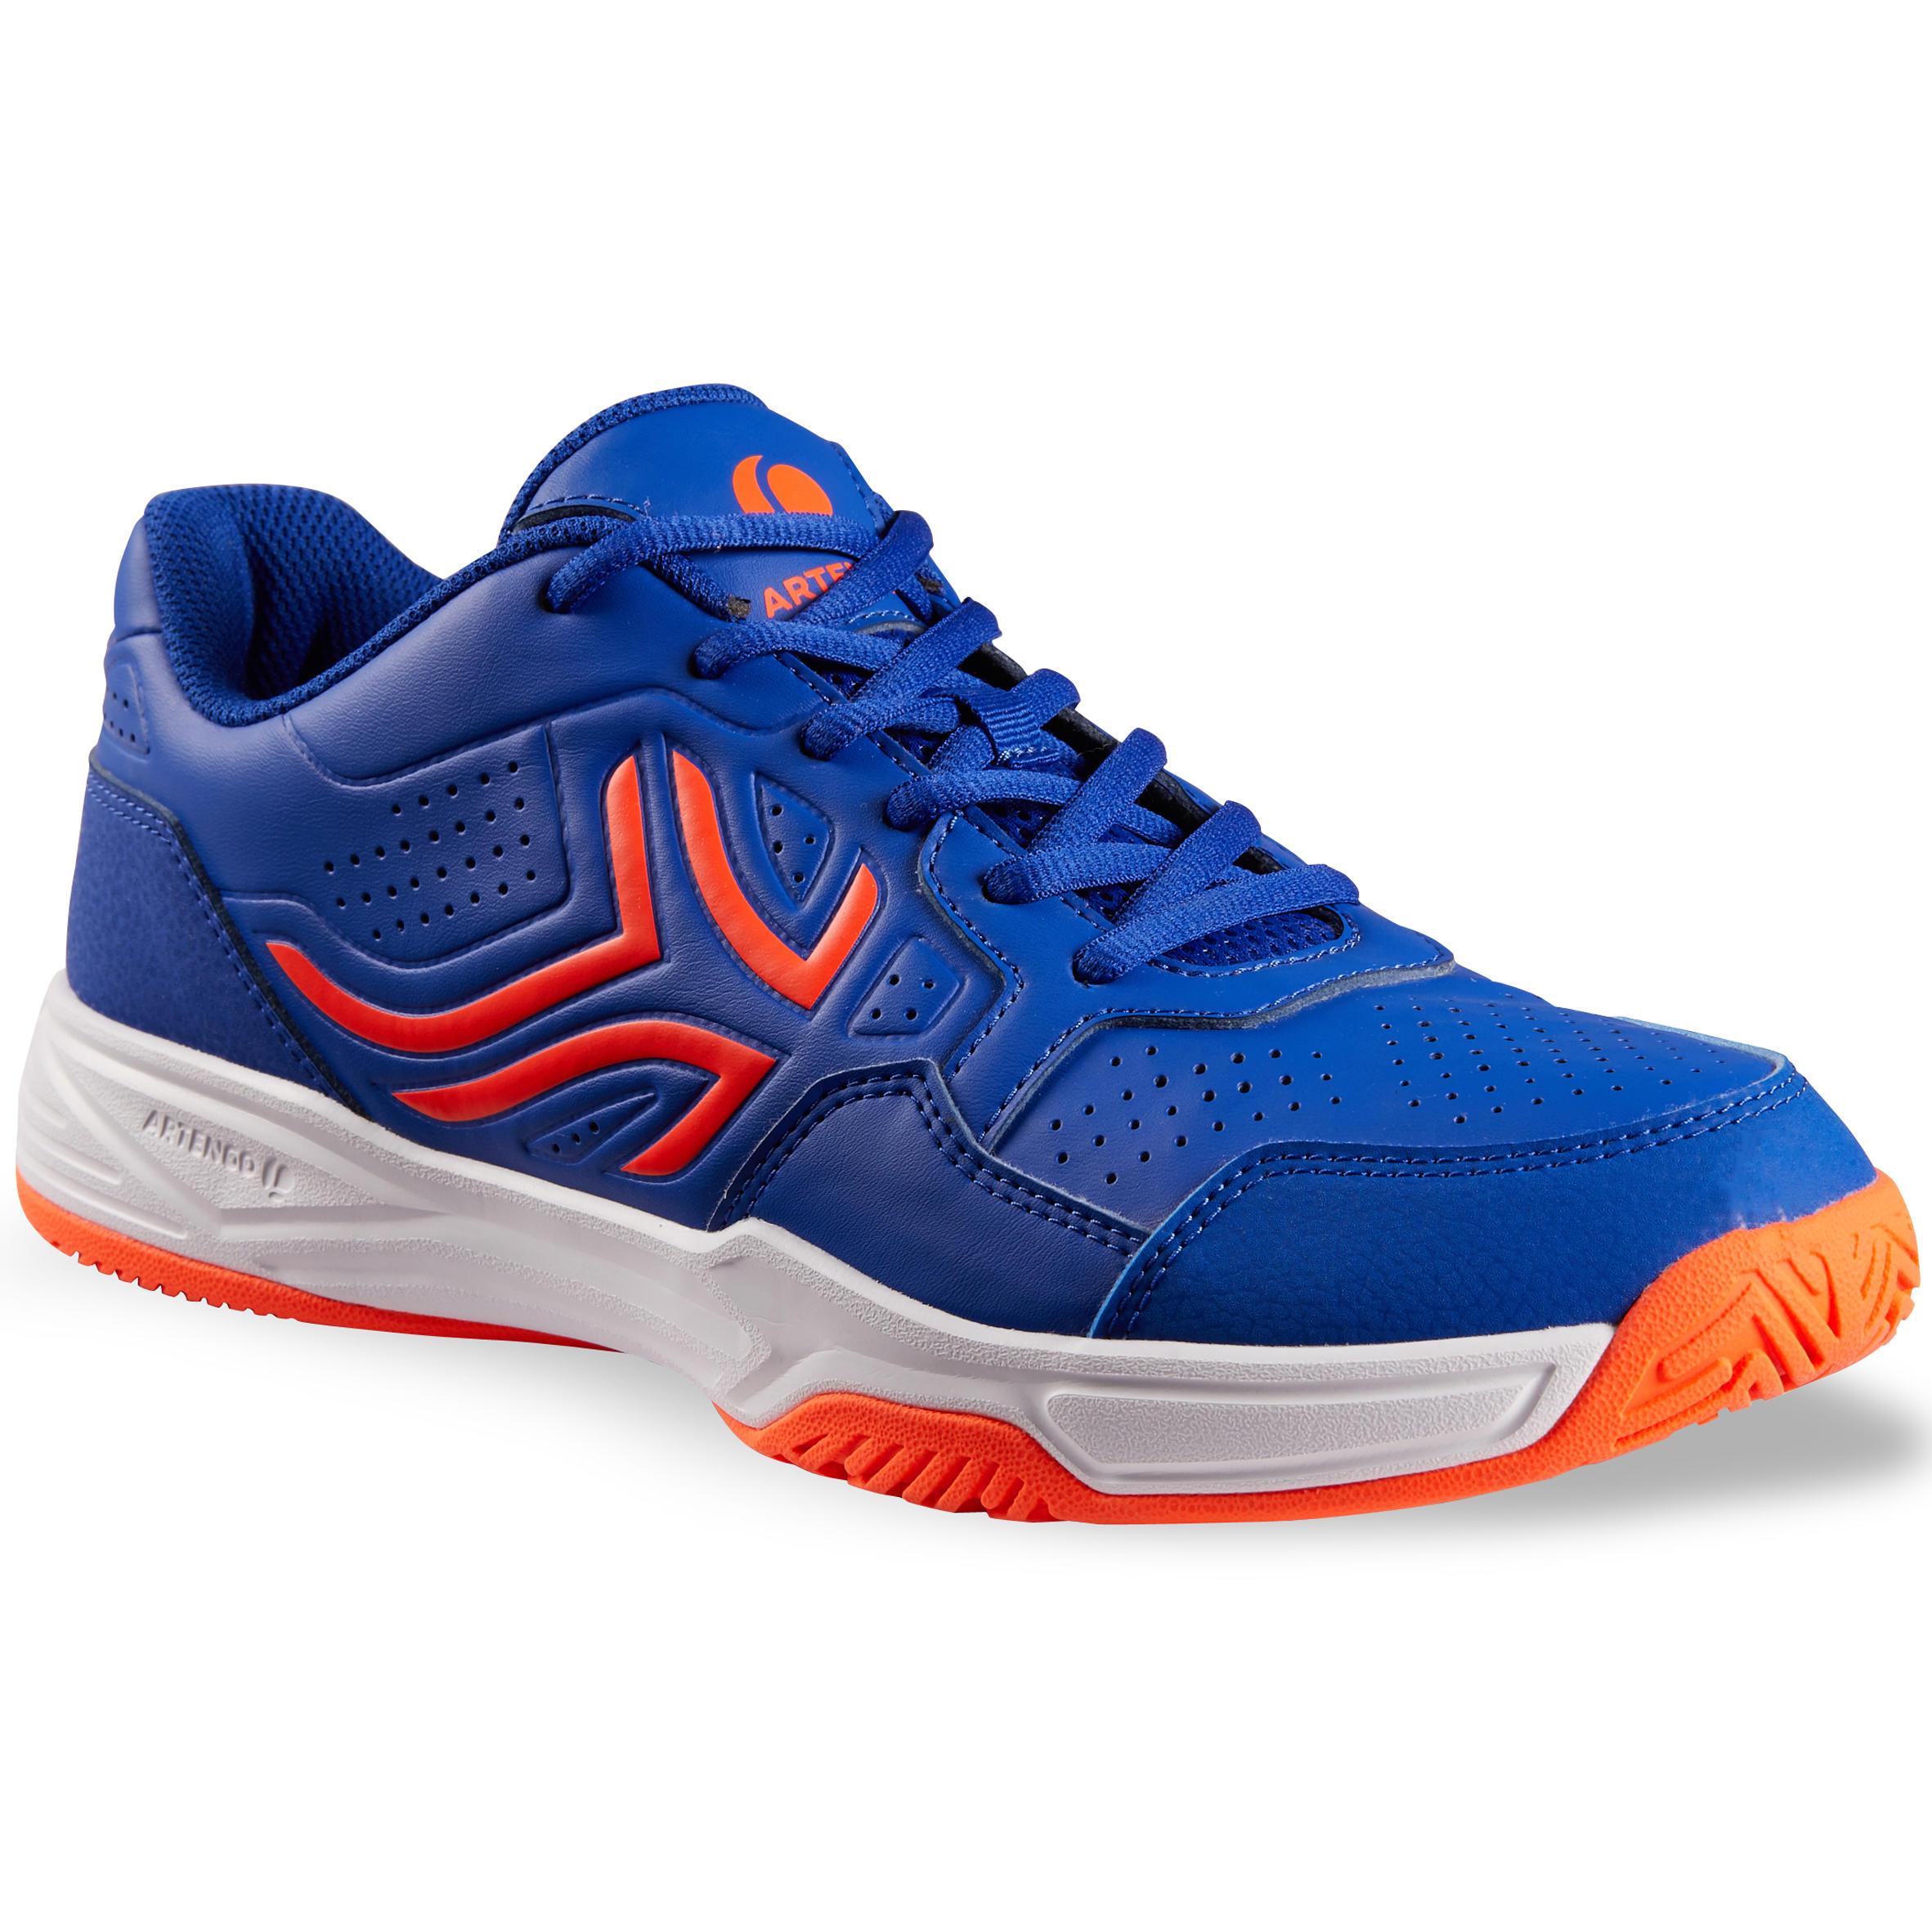 Tennisschuhe TS190 Multicourt Herren | Schuhe > Sportschuhe > Tennisschuhe | Artengo